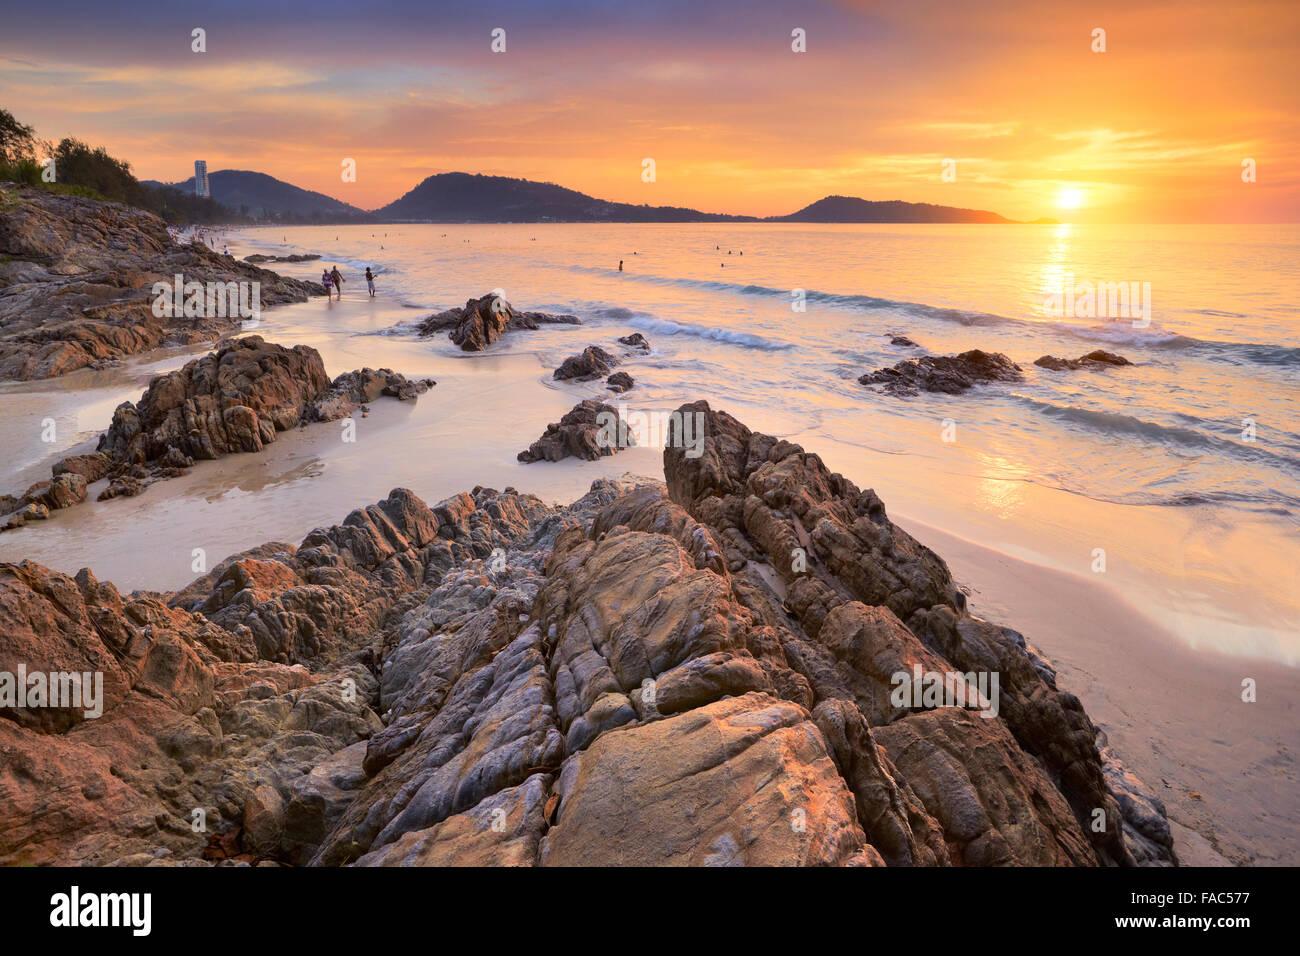 Thailandia - Phuket isola tropicale di Patong Beach al tramonto Immagini Stock